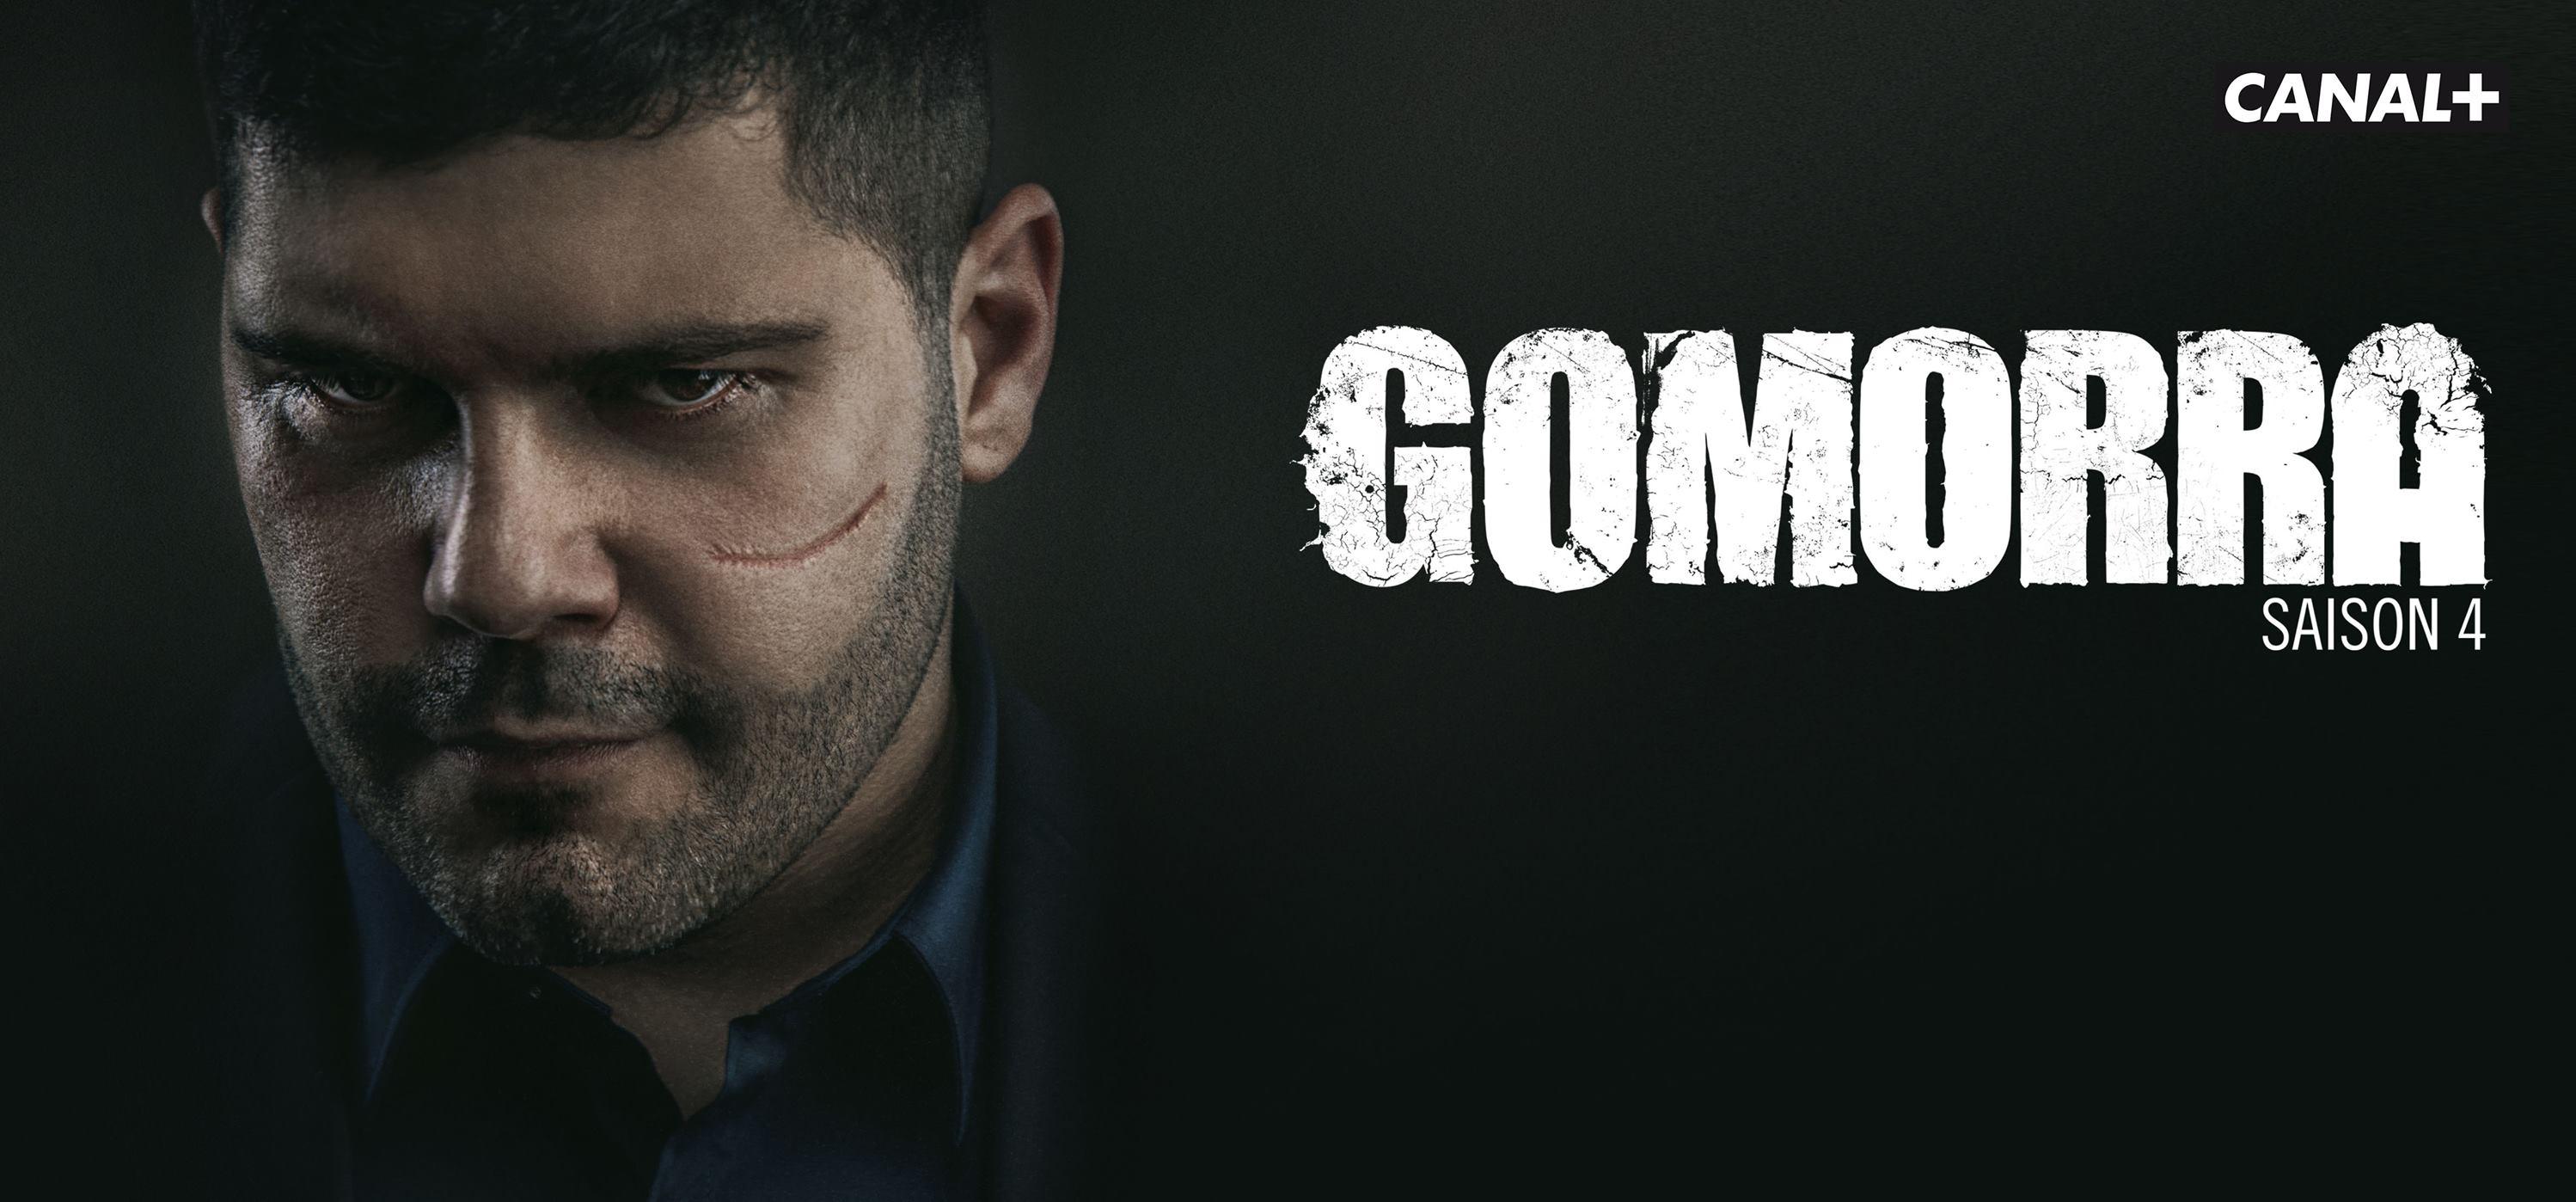 【義劇】《格莫拉》Gomorra.-.La.serie.S04E02